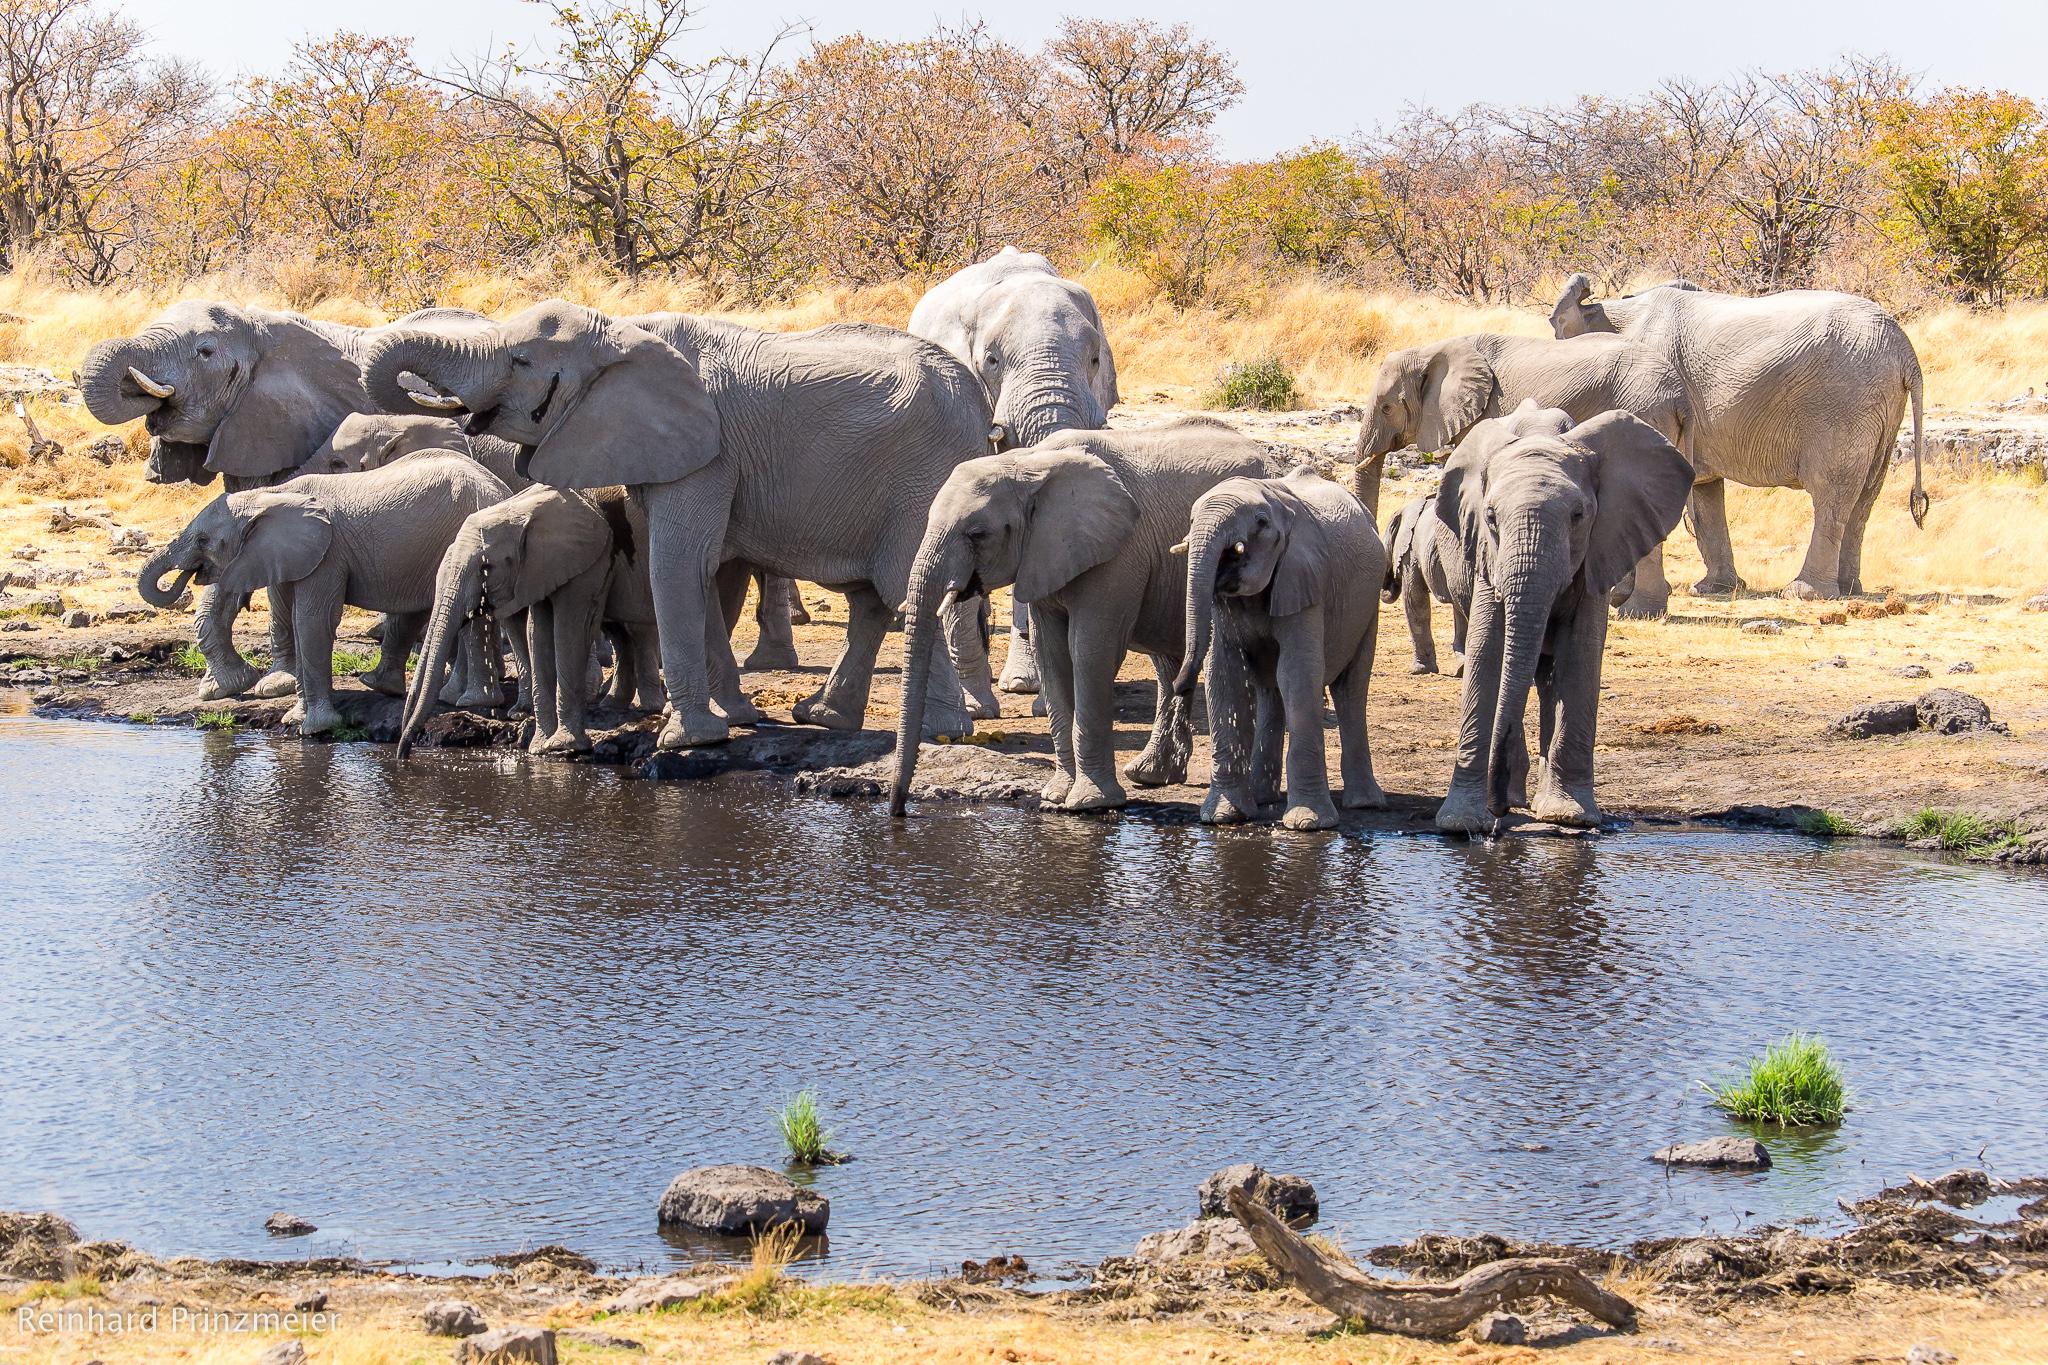 Nuamses waterhole, Namibia